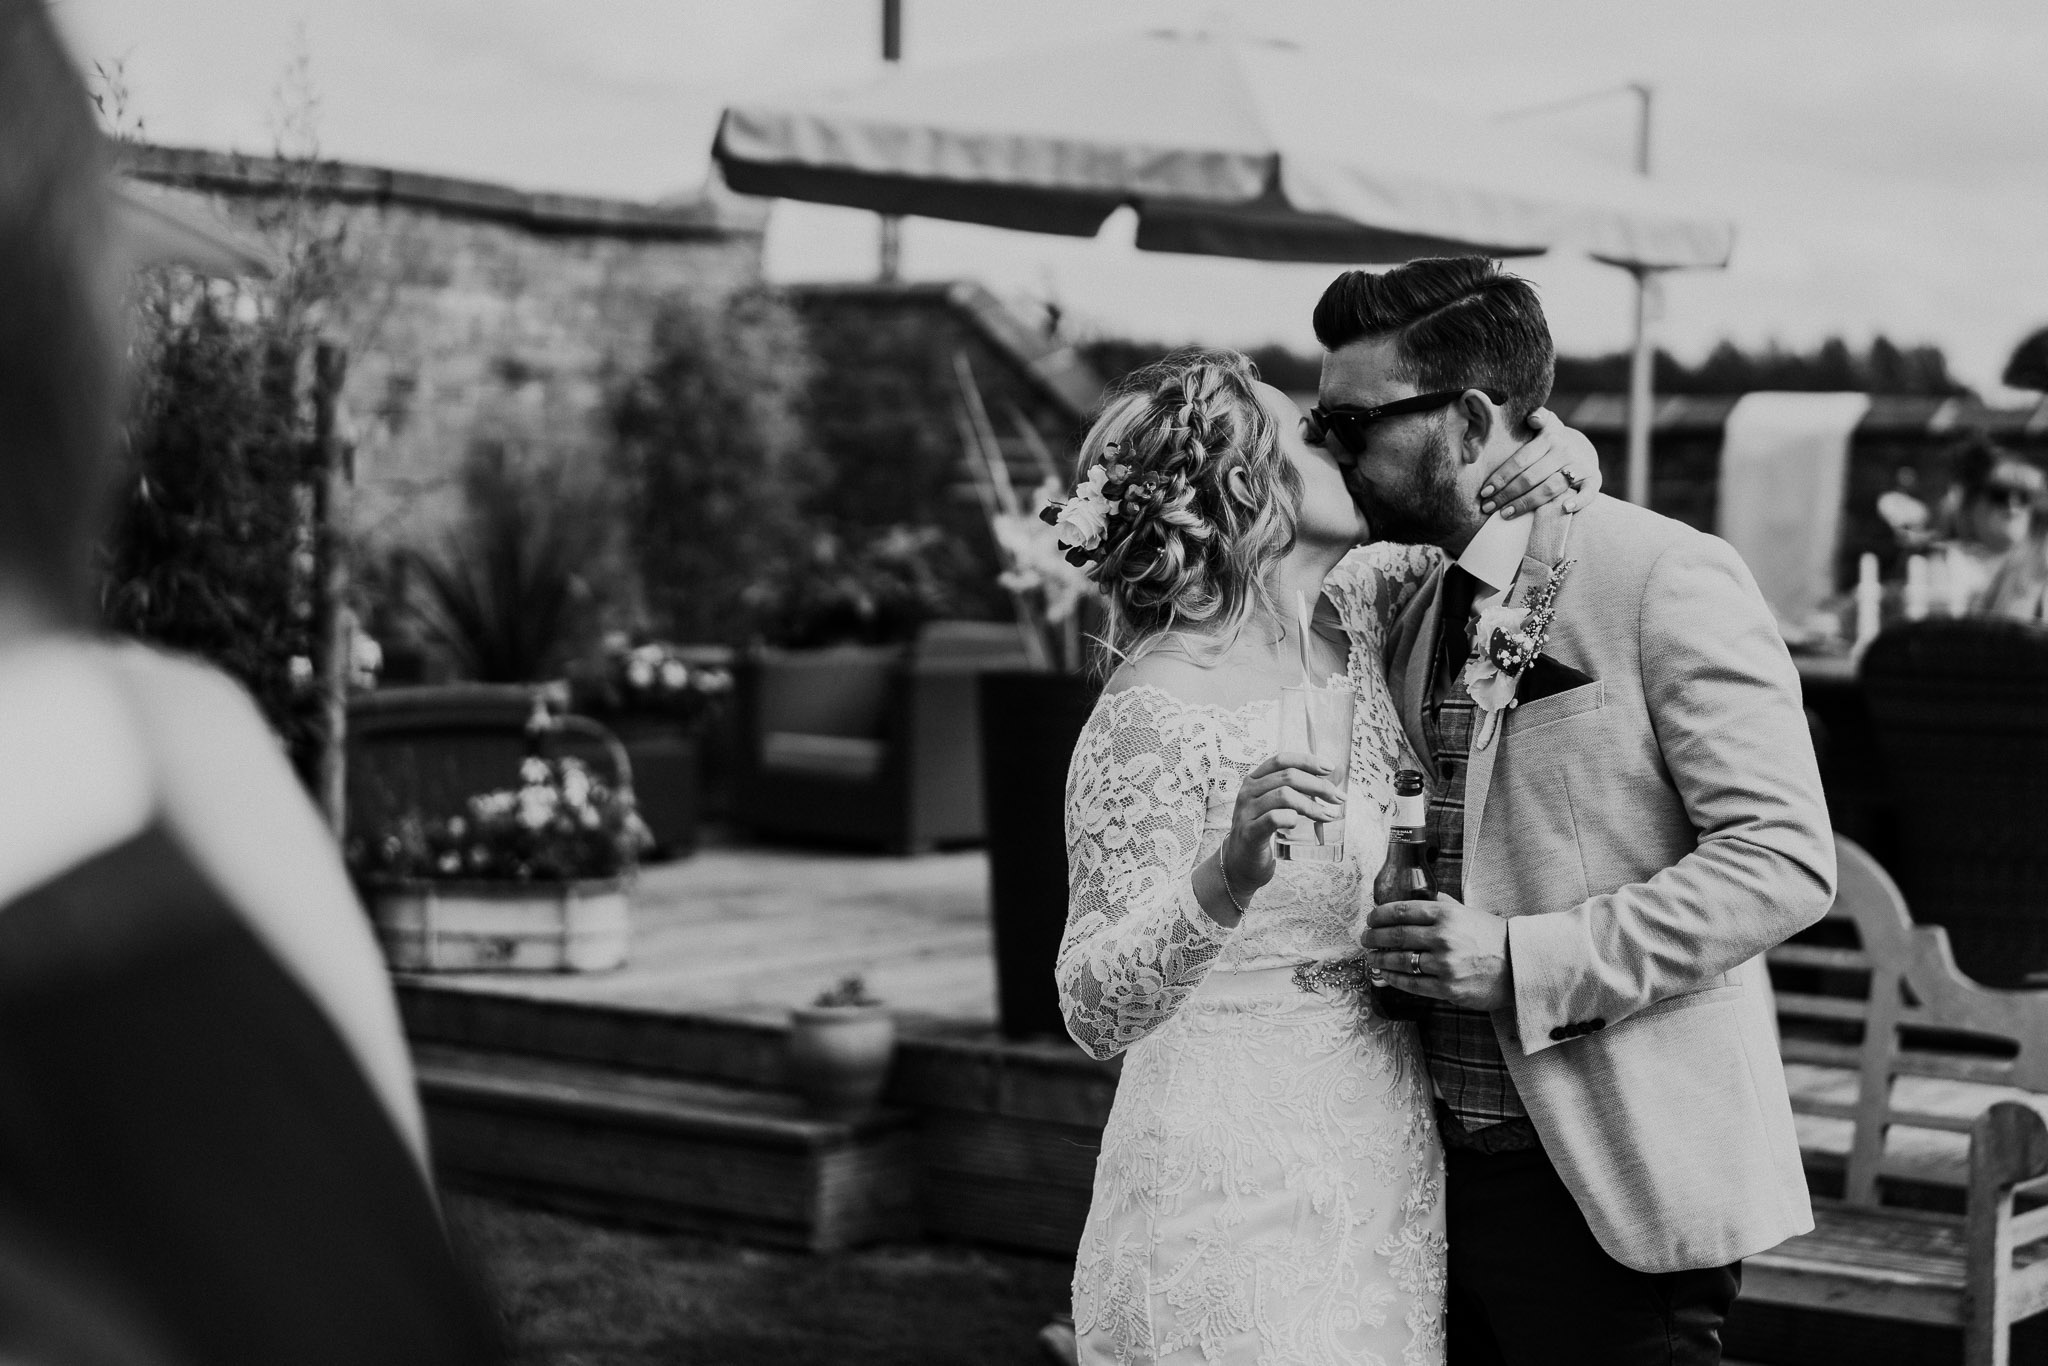 bride-and-groom-unposed